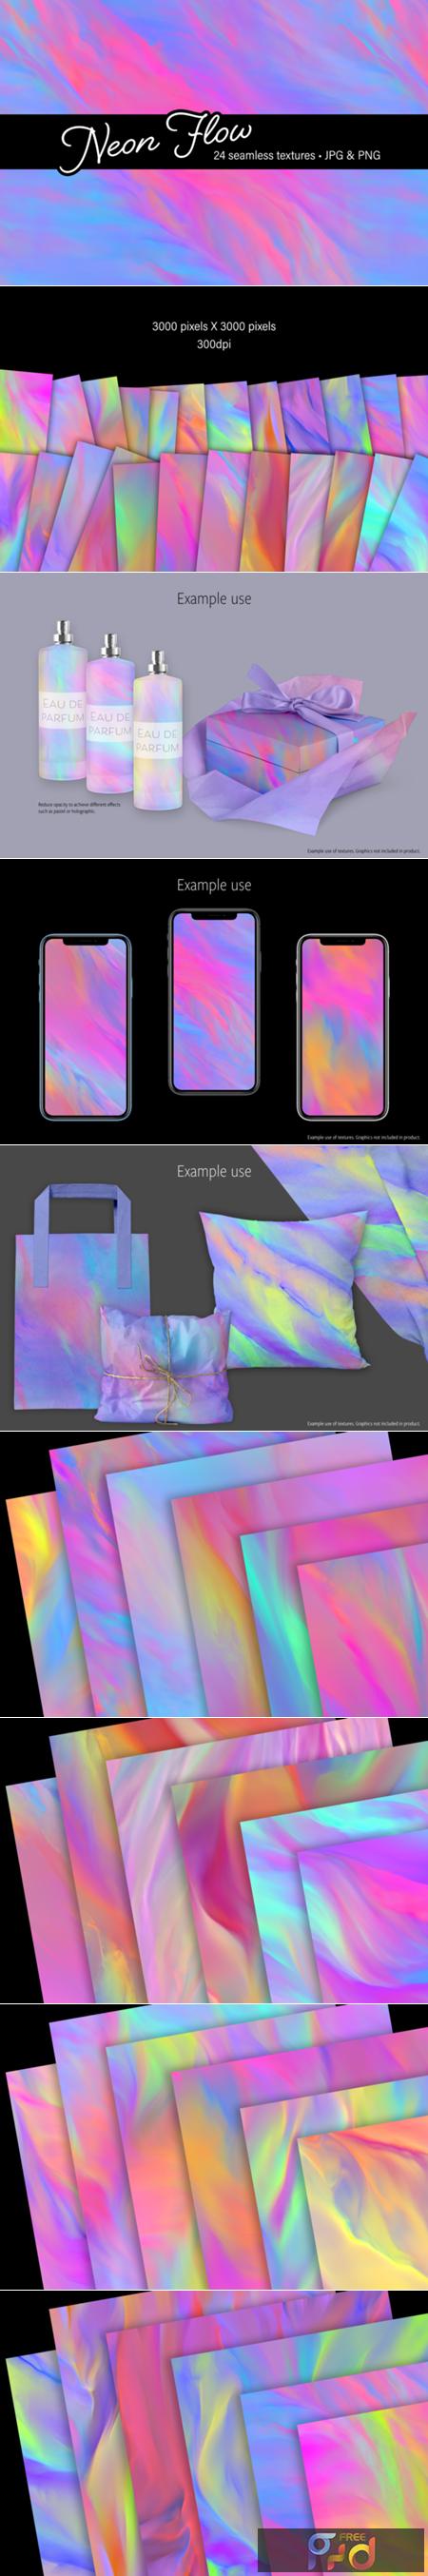 Neon Flow - Graphics 1508679 1